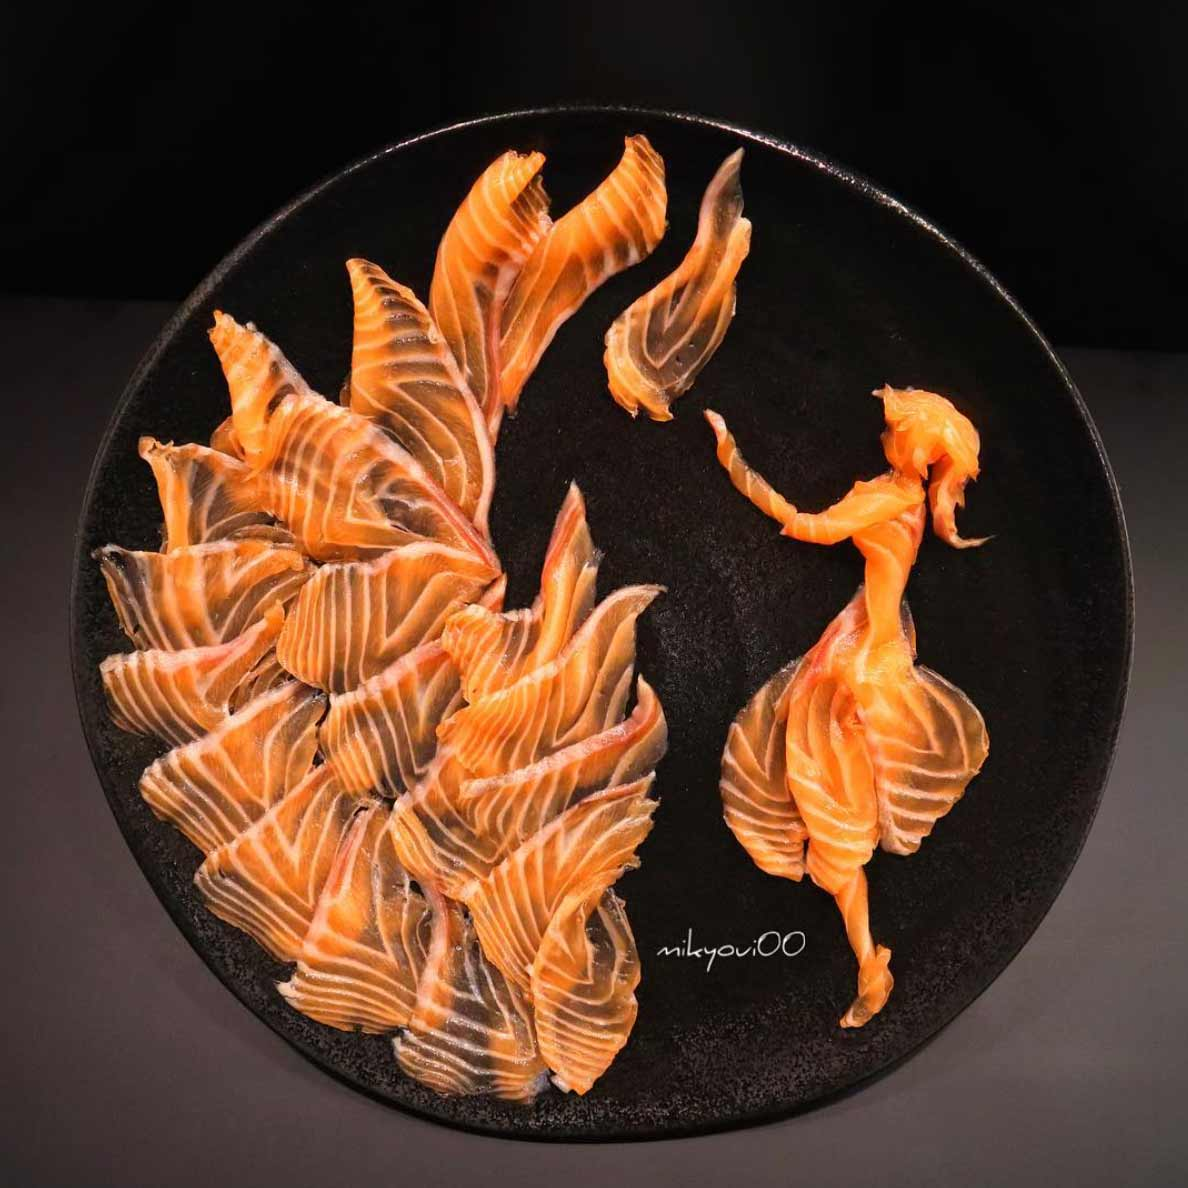 Wundervolle Sashimi-Kunstwerke von mikyou mikyou-sashimi-art-sushi-fischbilder_10